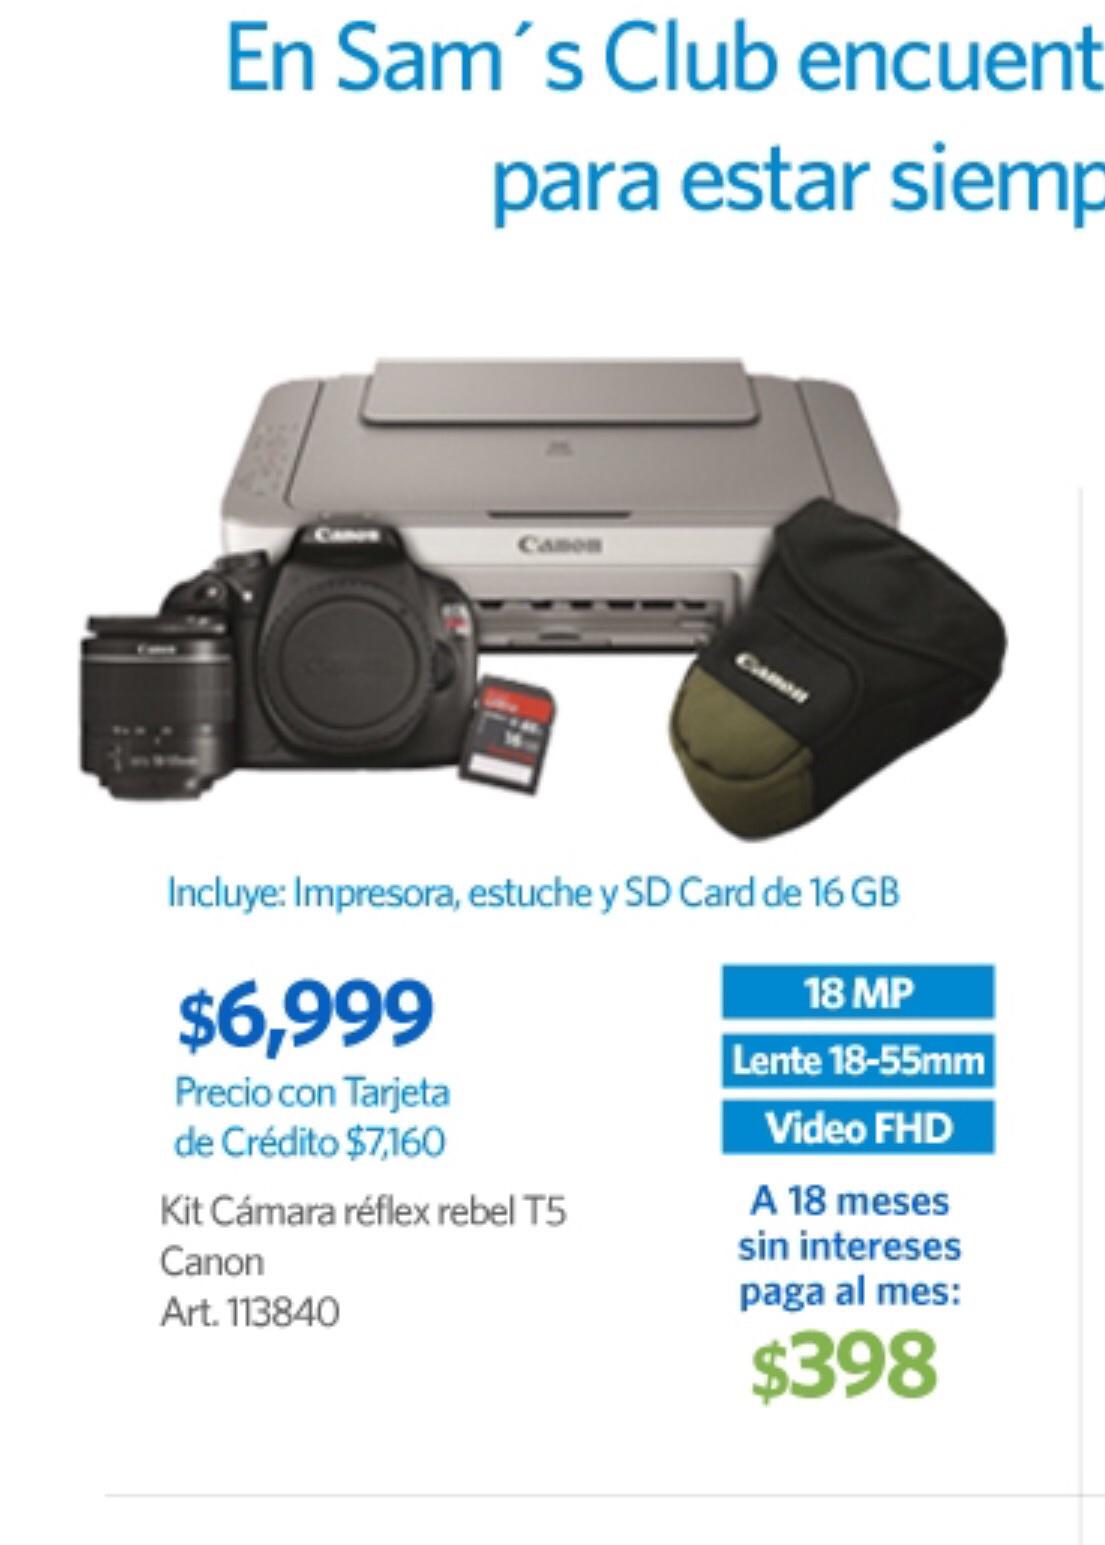 Sam's Club: Paquete cámara DSLR Canon T5 $6,999